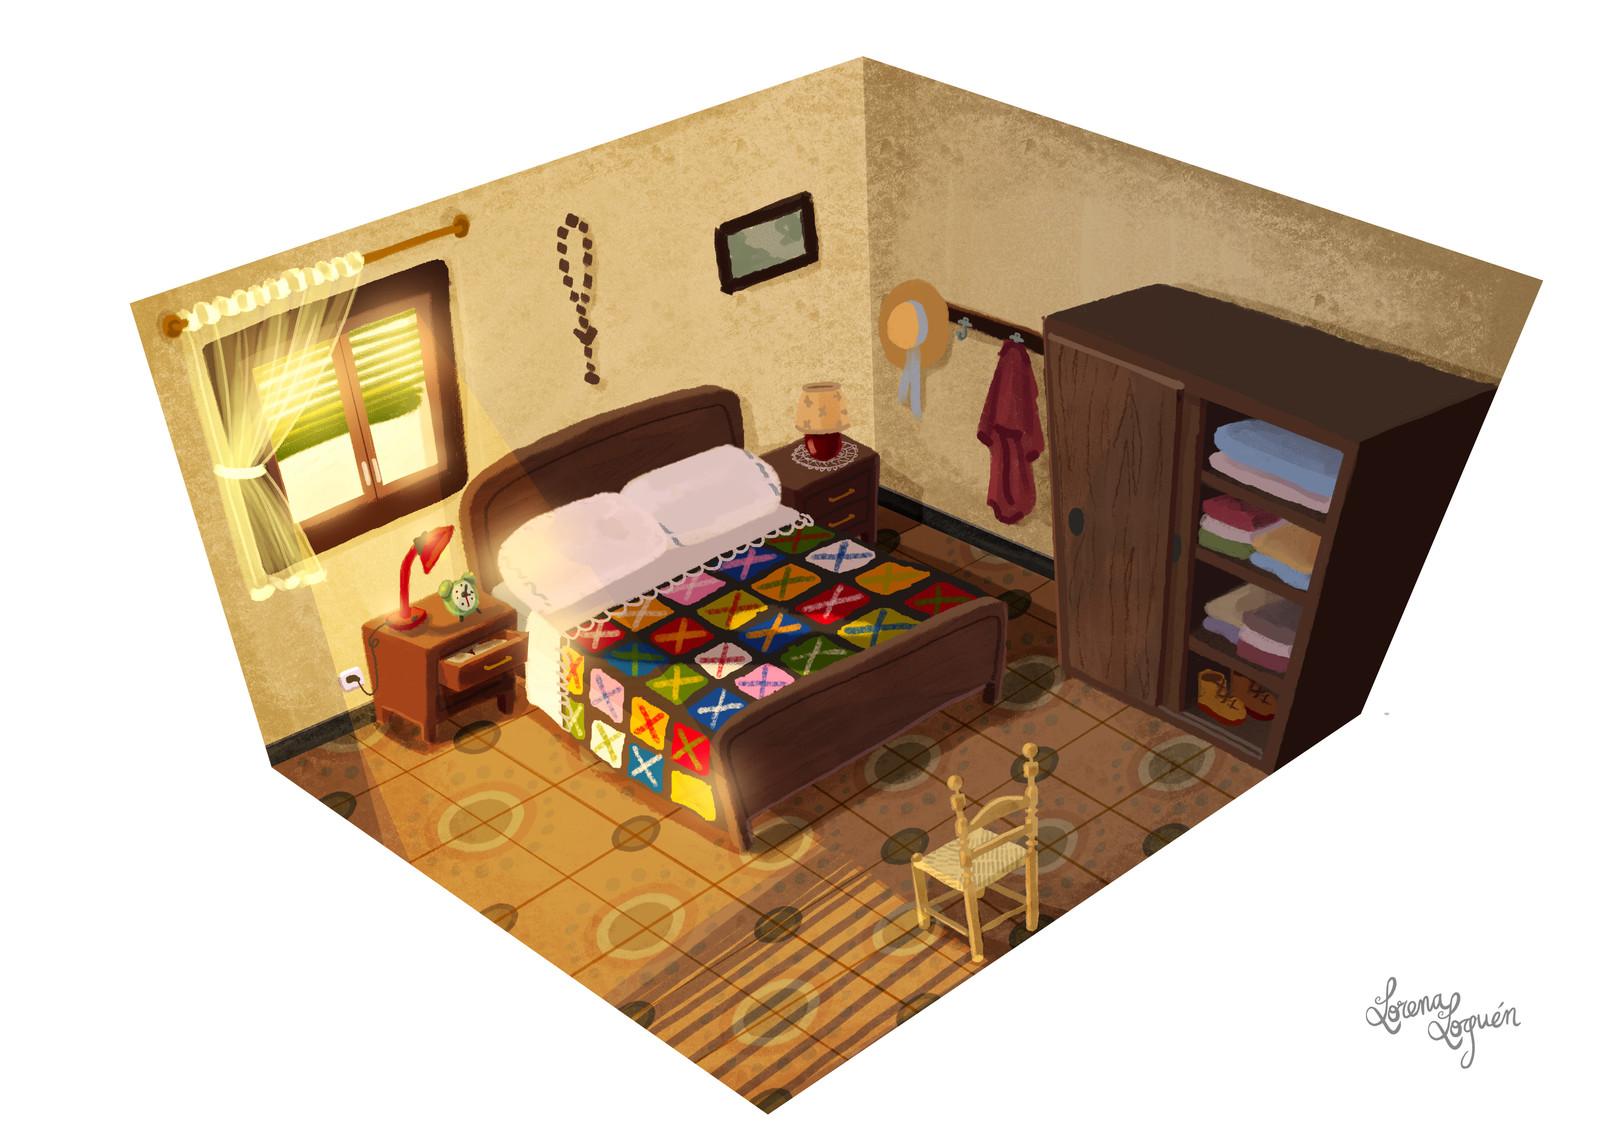 Spanish 70's Bedroom